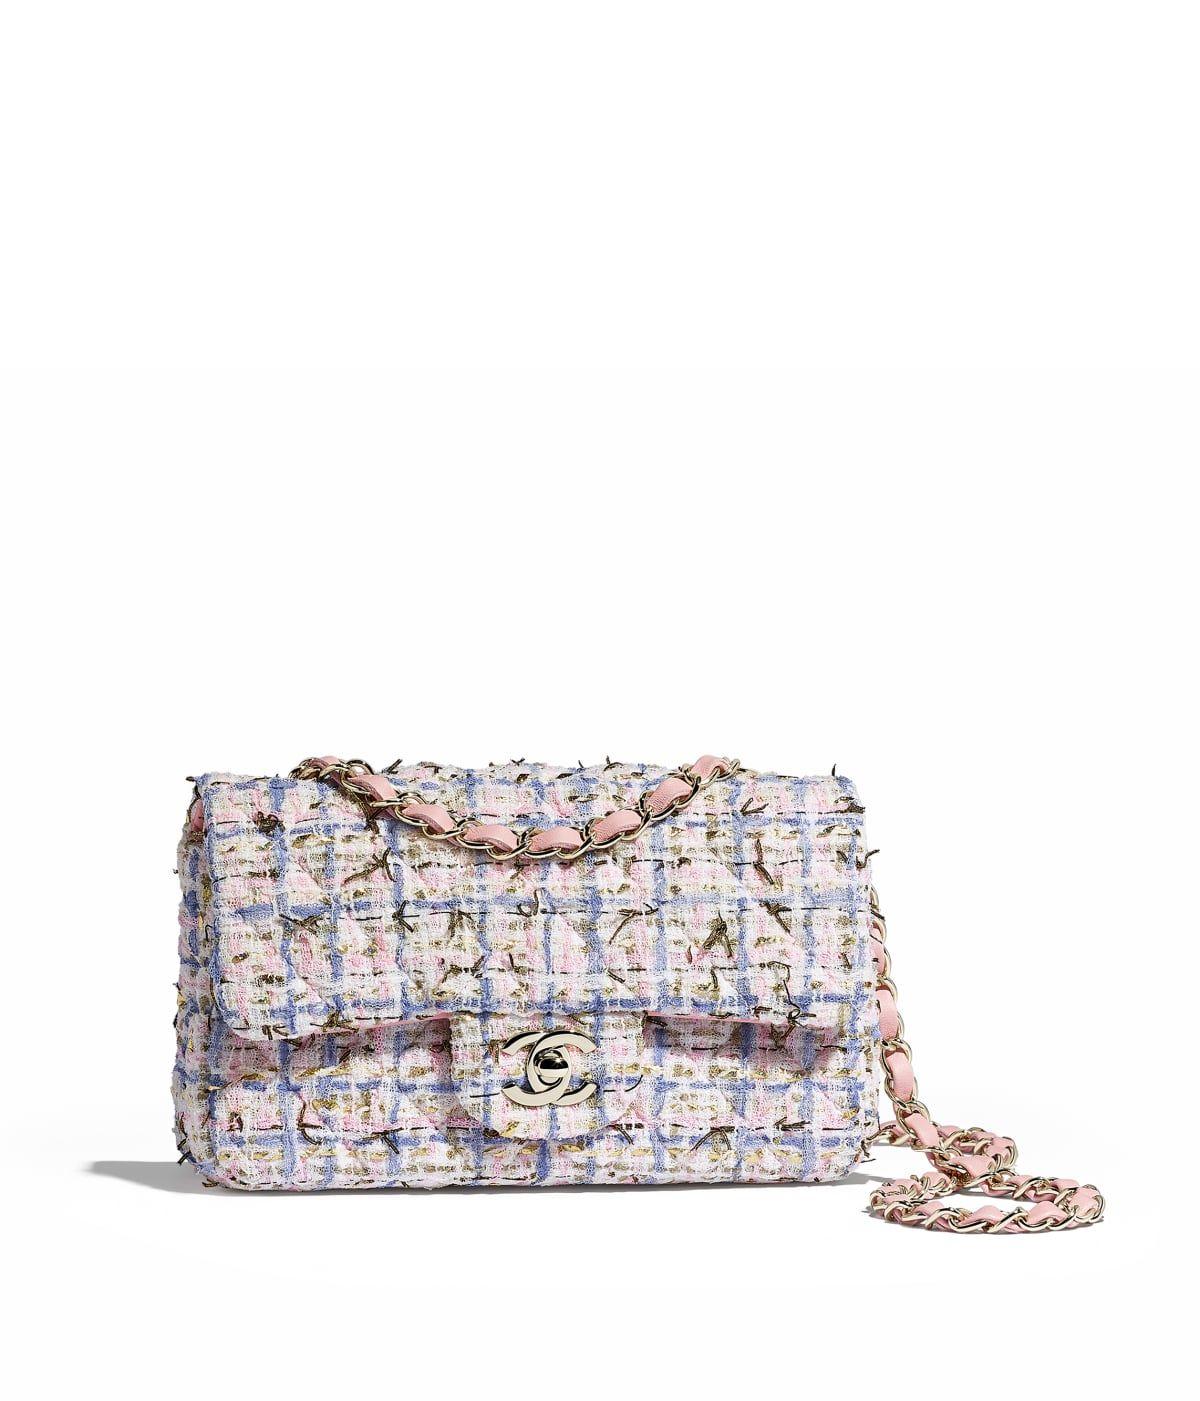 ec8f7044 Handbags of the Cruise 2018/19 CHANEL Fashion collection : Mini Flap ...